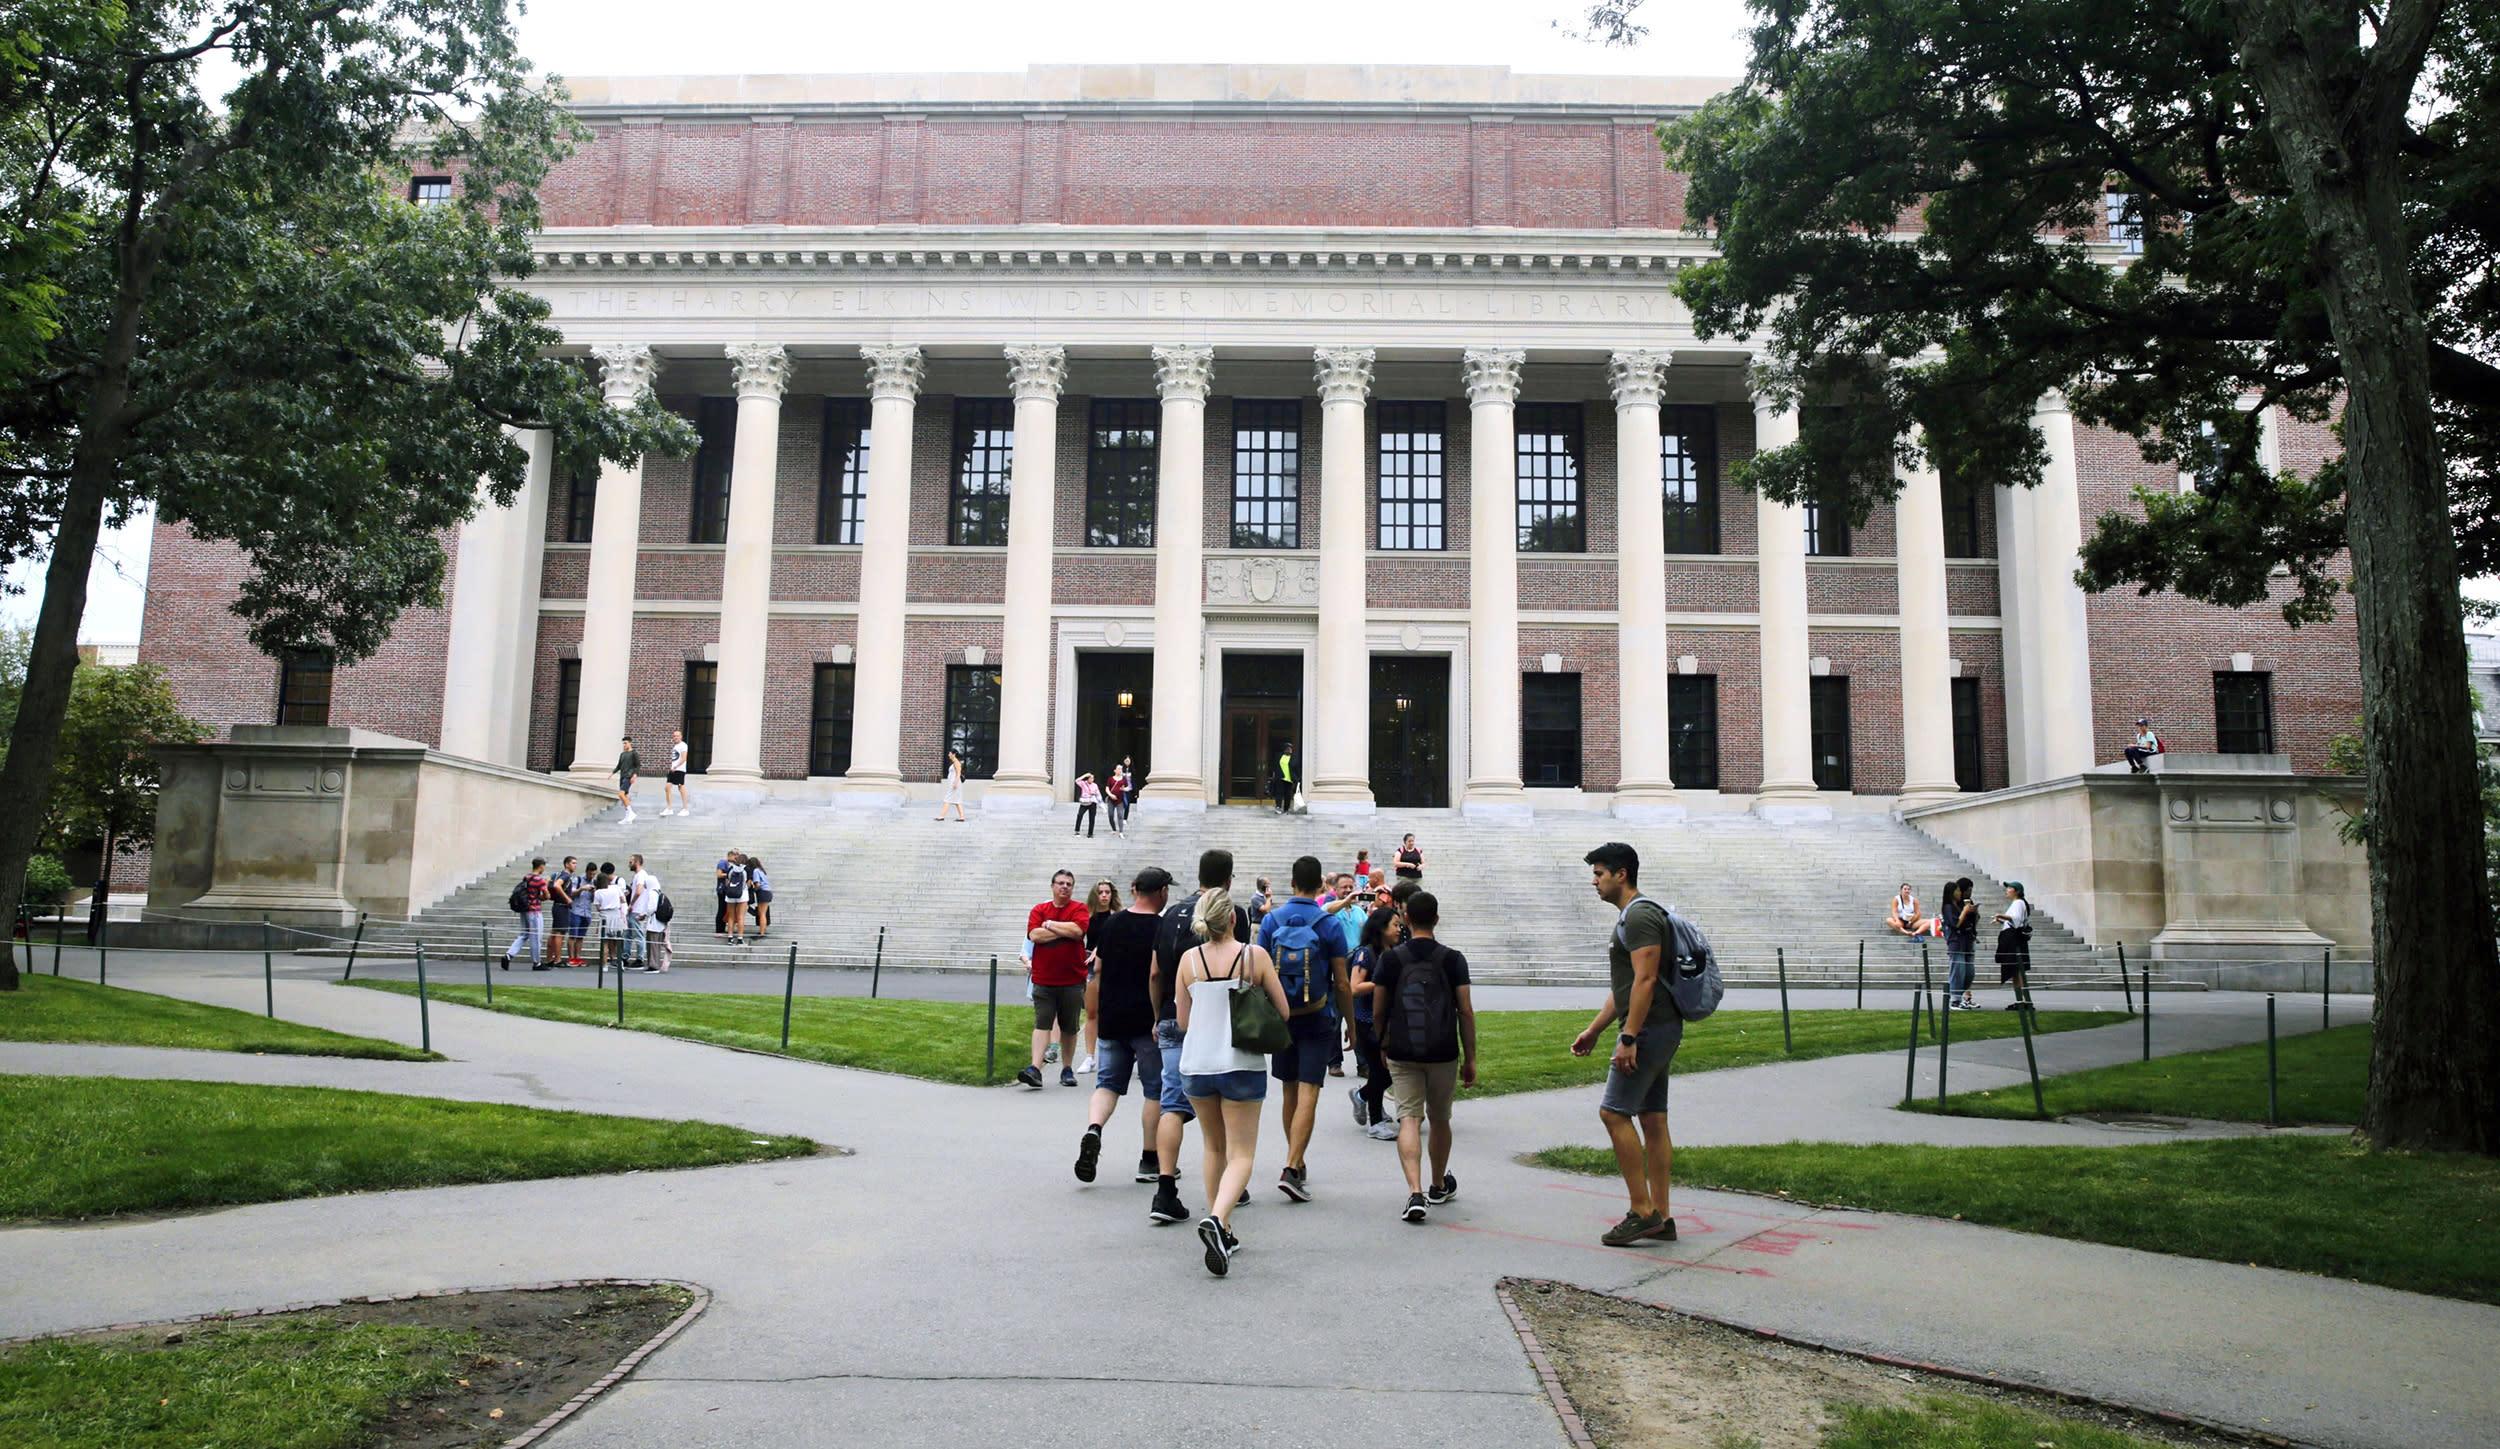 Appeals court challenges claim that Harvard discriminates against Asian American applicants